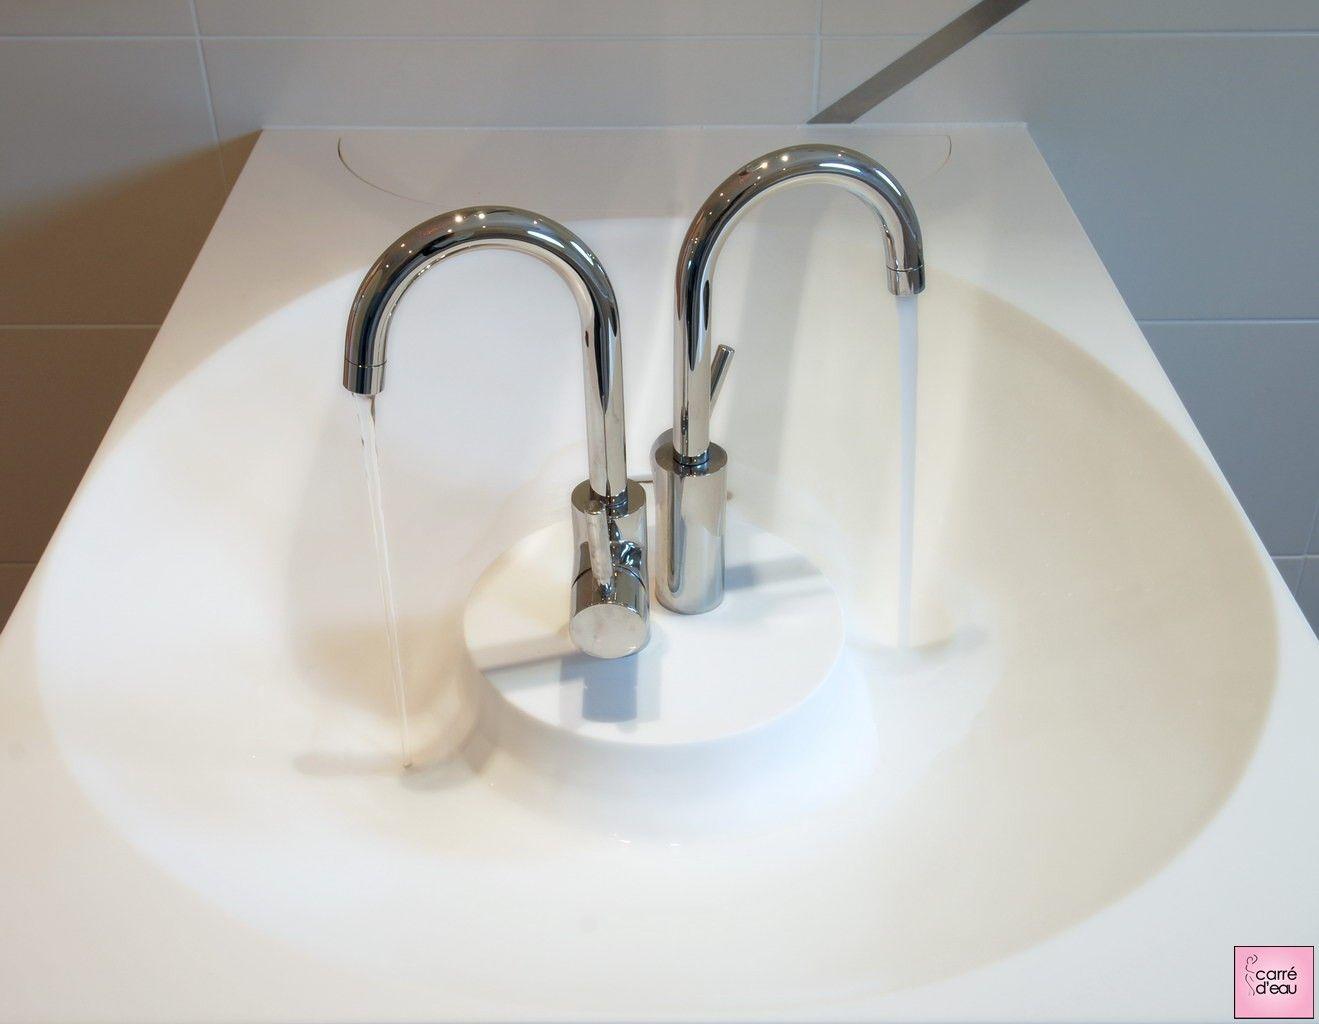 double vasque et double robinet idee sdb salle de bain. Black Bedroom Furniture Sets. Home Design Ideas